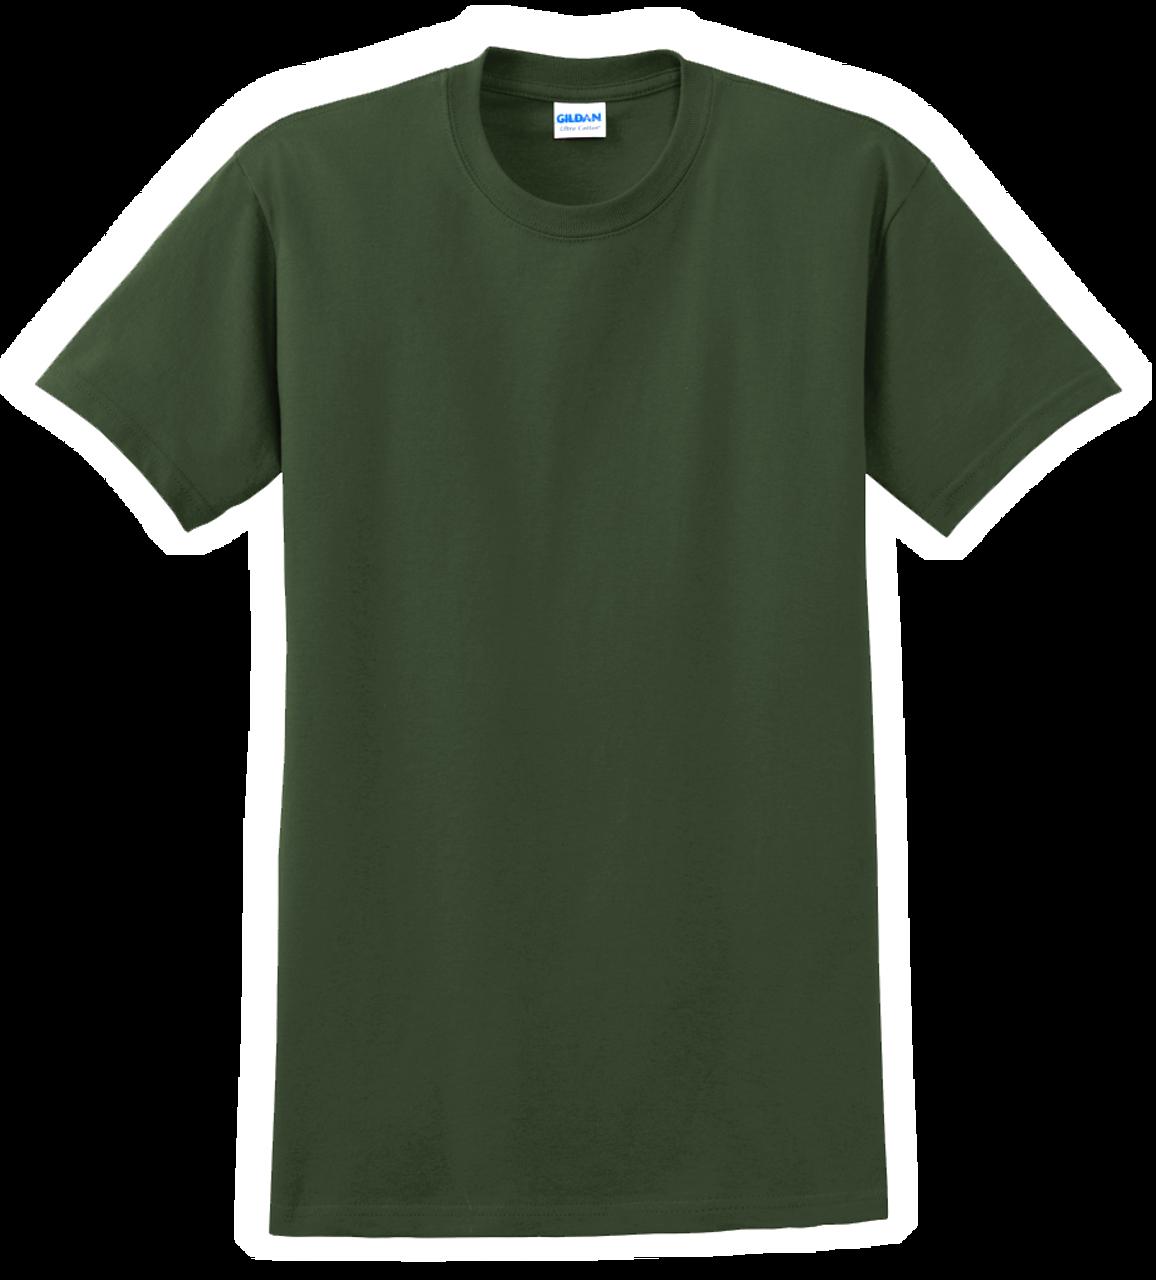 G2000B Forest Green Youth T-Shirt Short Sleeve by Gildan